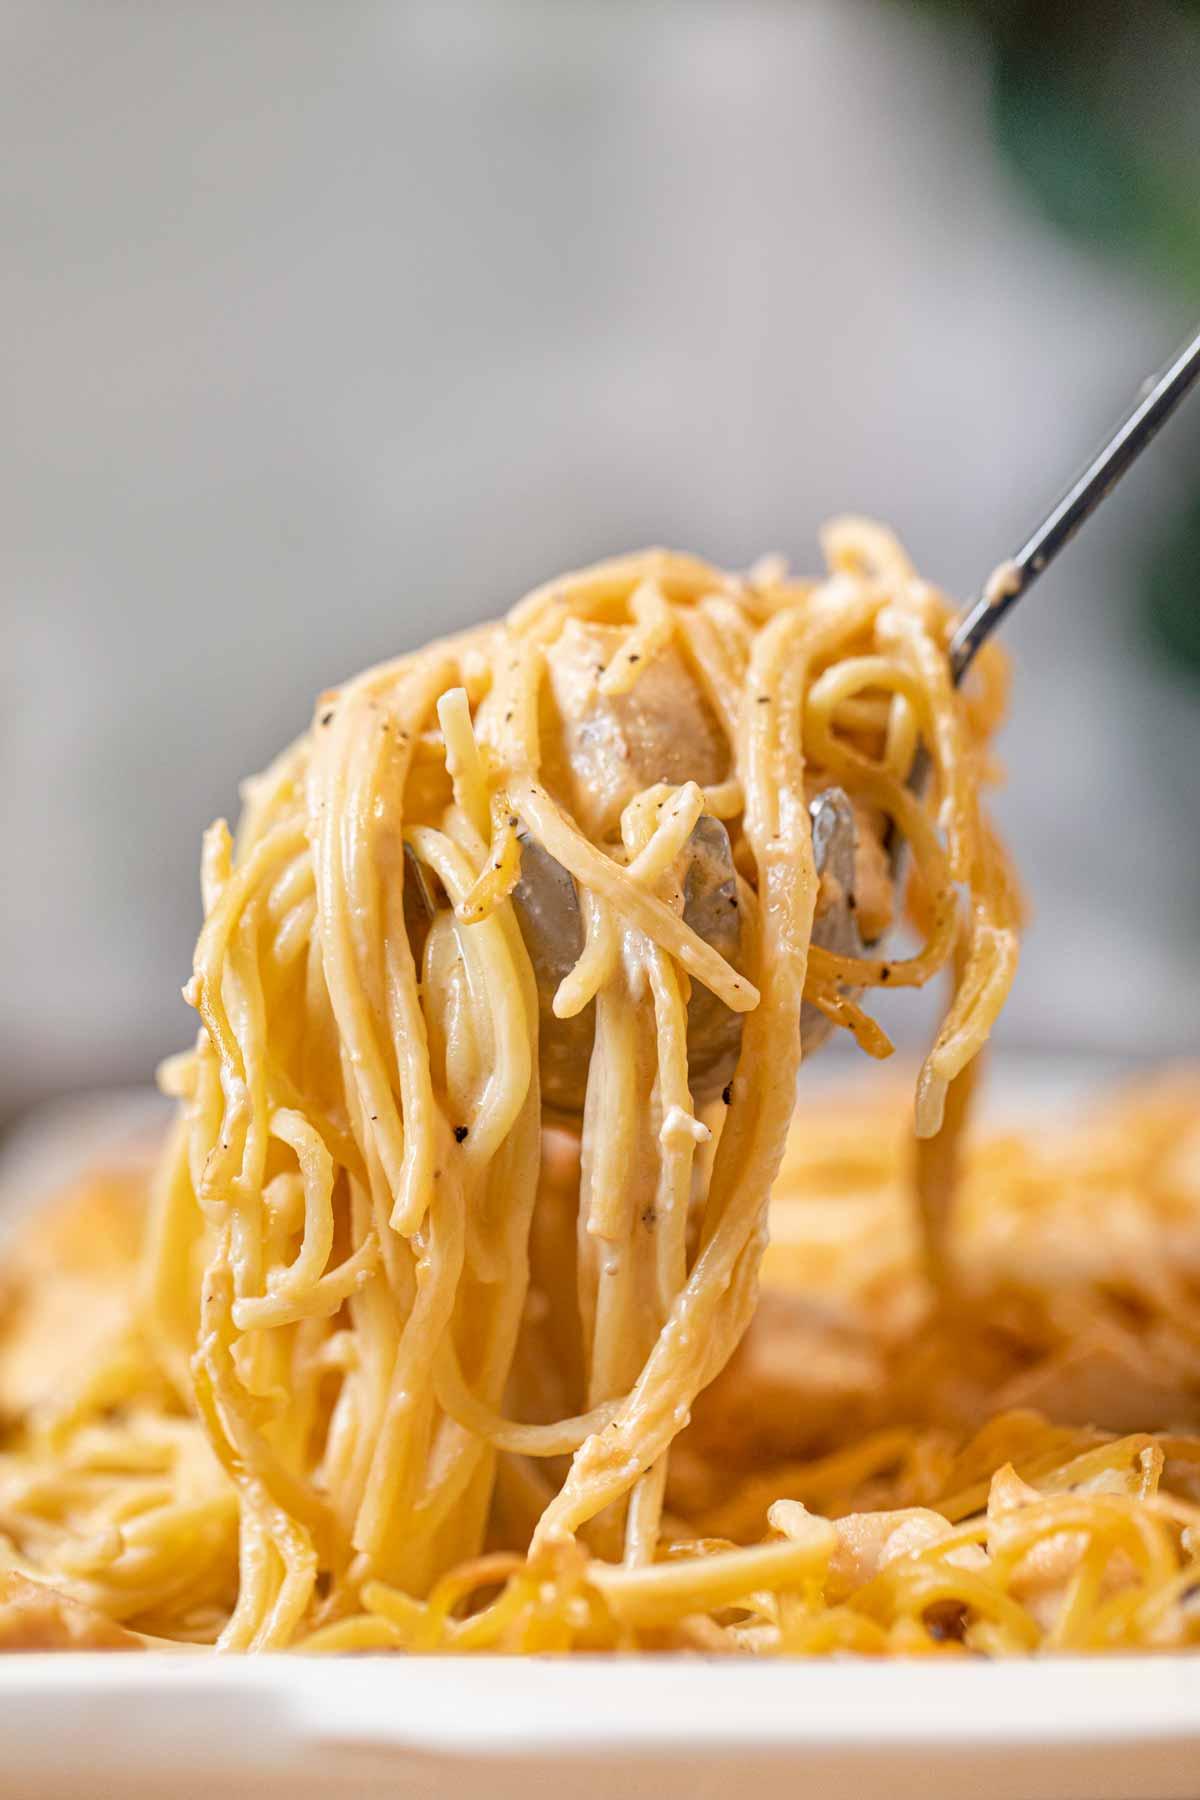 Baked Chicken Spaghetti in scoop